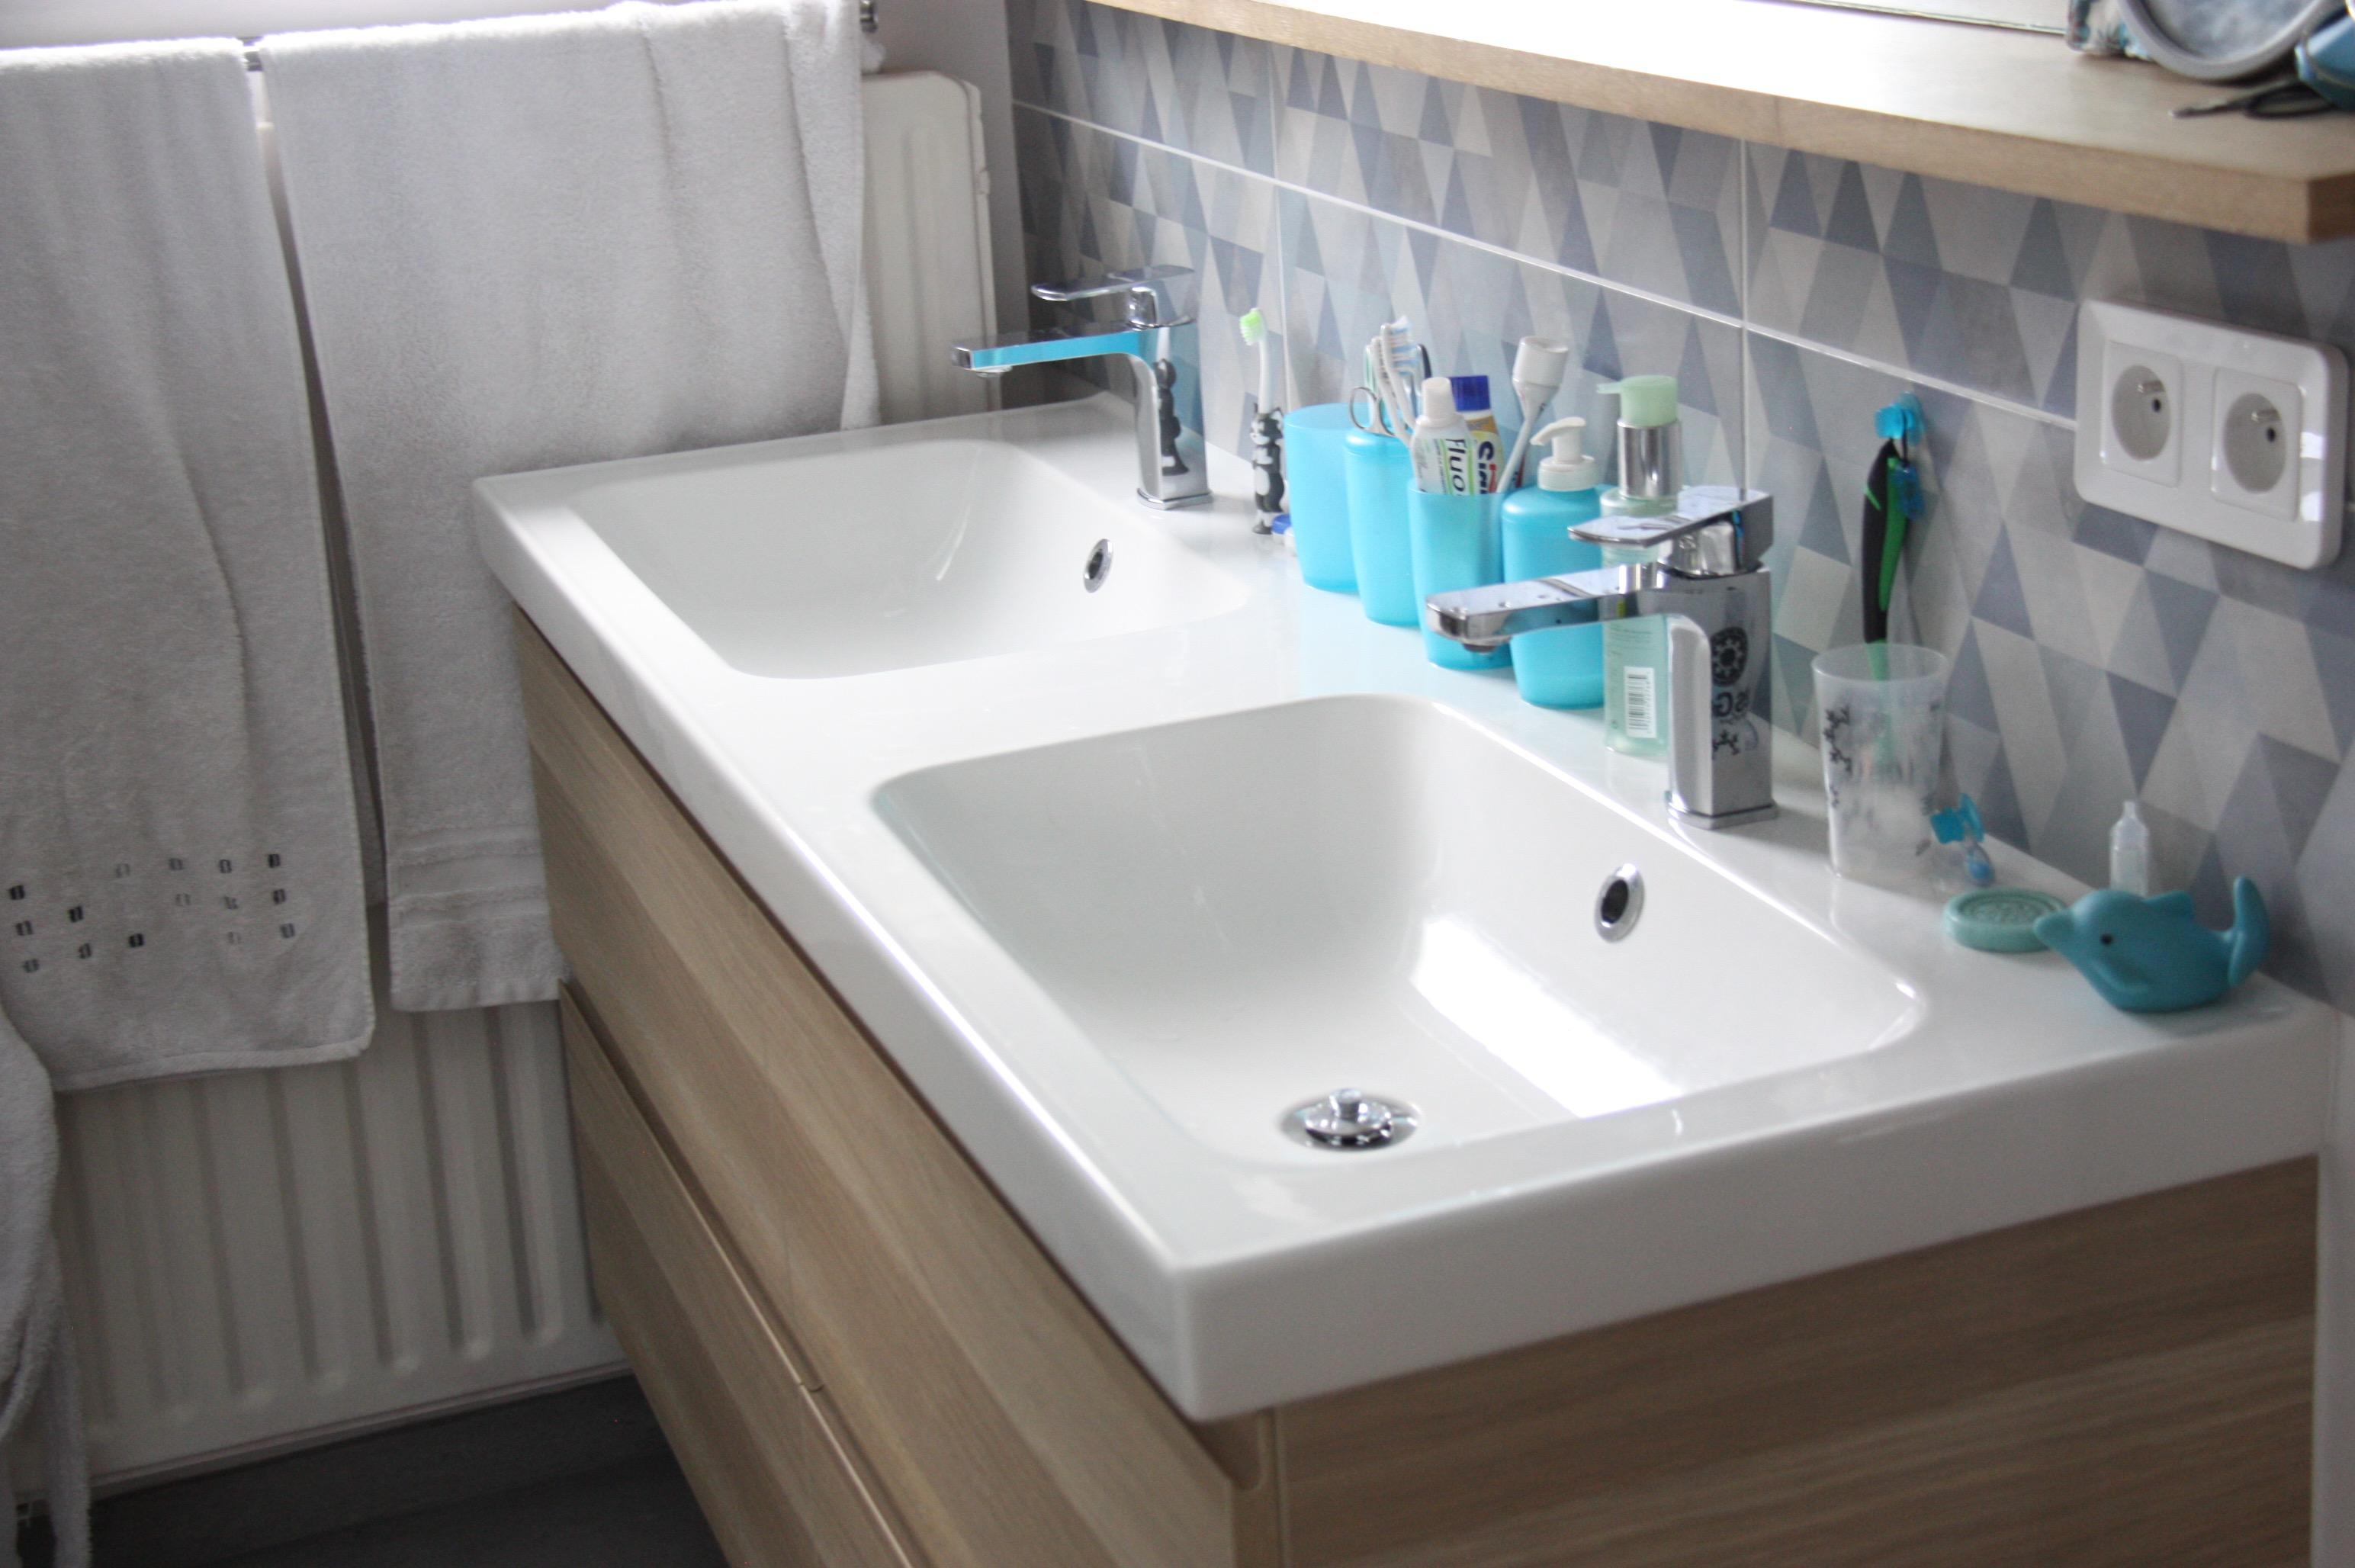 Salle De Bain Zone De Securite ~ salle de bain scandinave gwenadeco